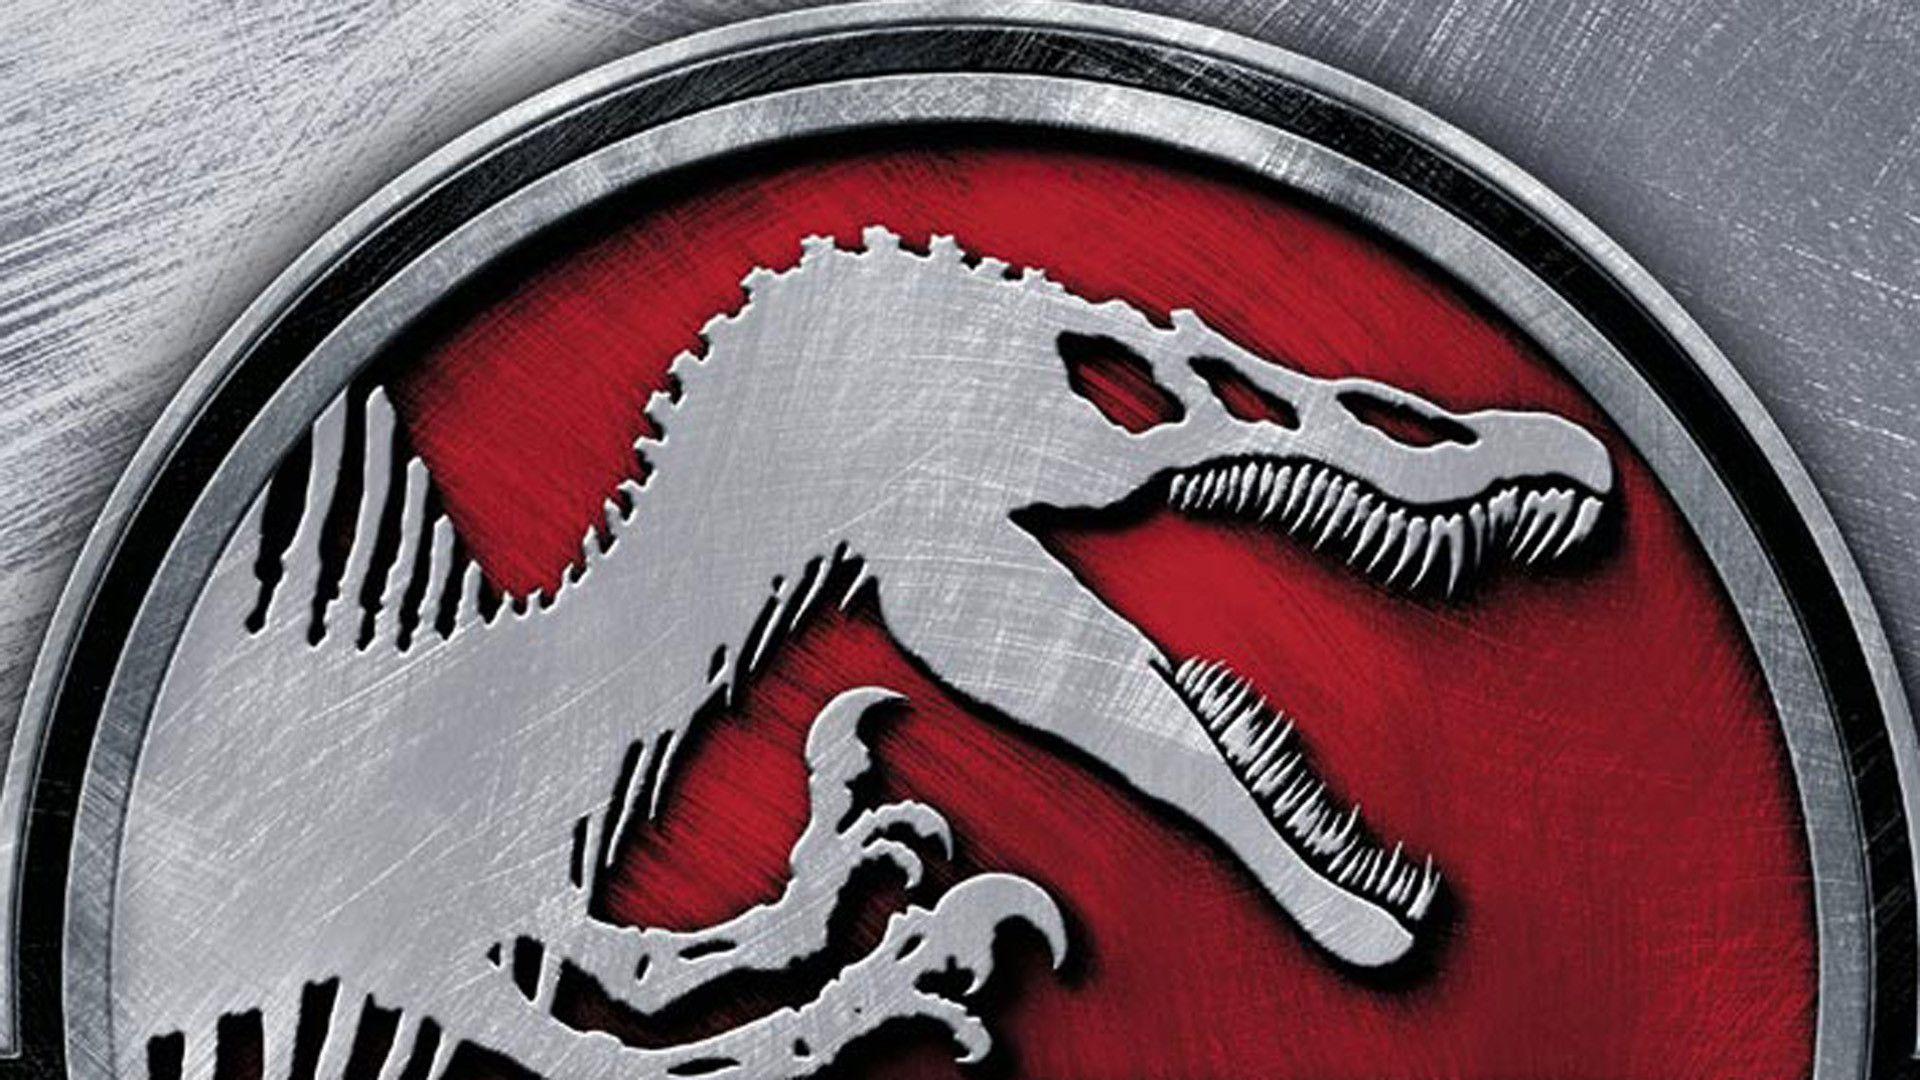 Jurassic Park III HD Wallpapers Backgrounds Wallpaper